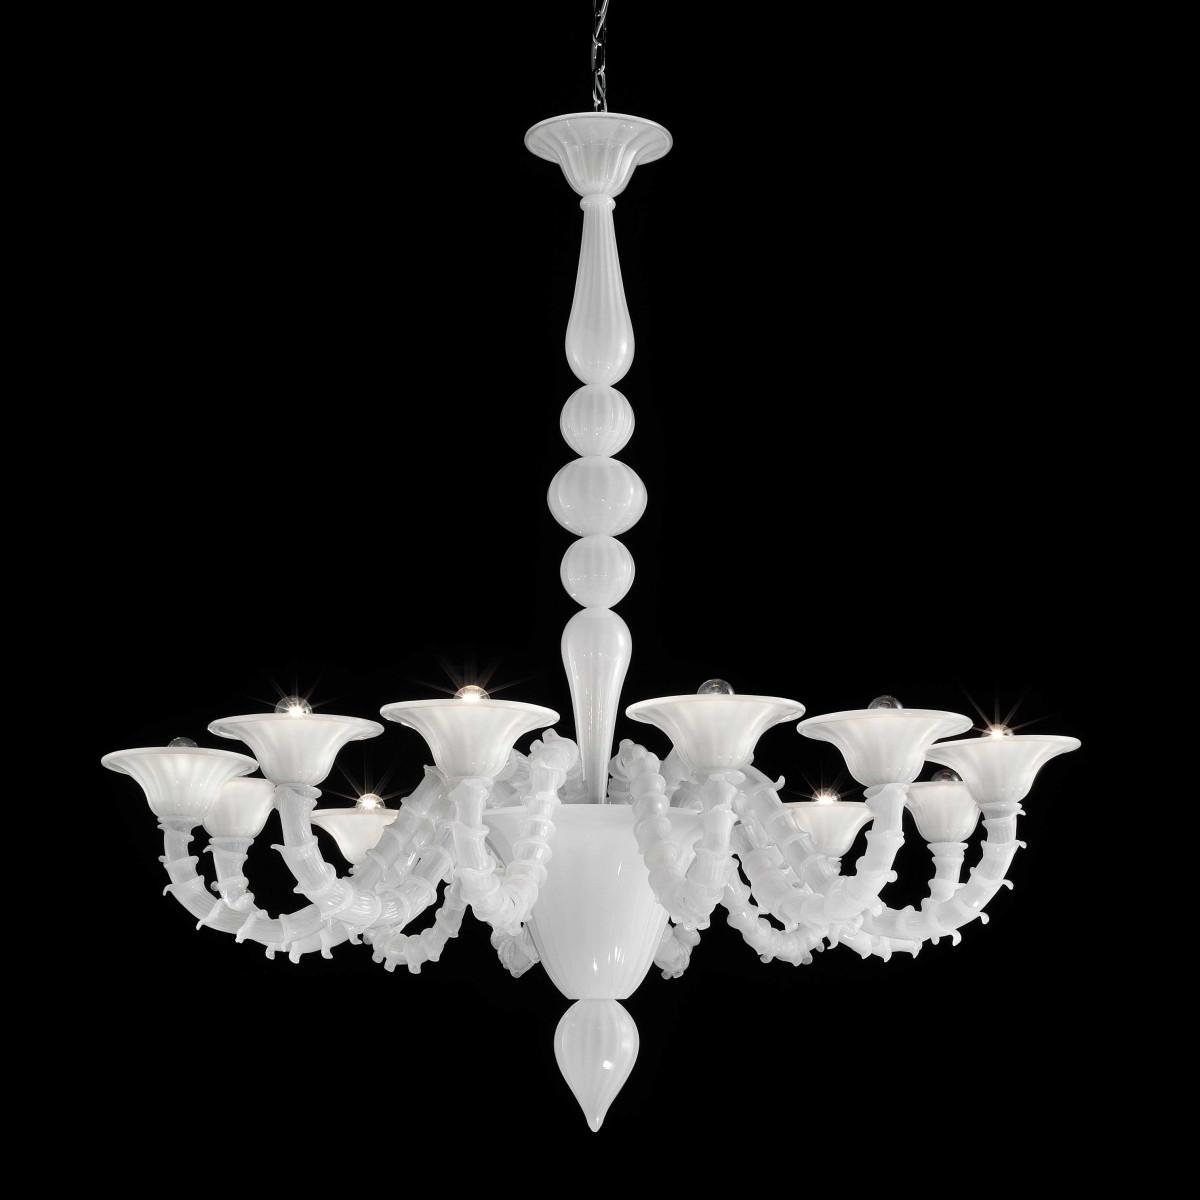 """Candido"" Murano glass chandelier - 6 lights - white"